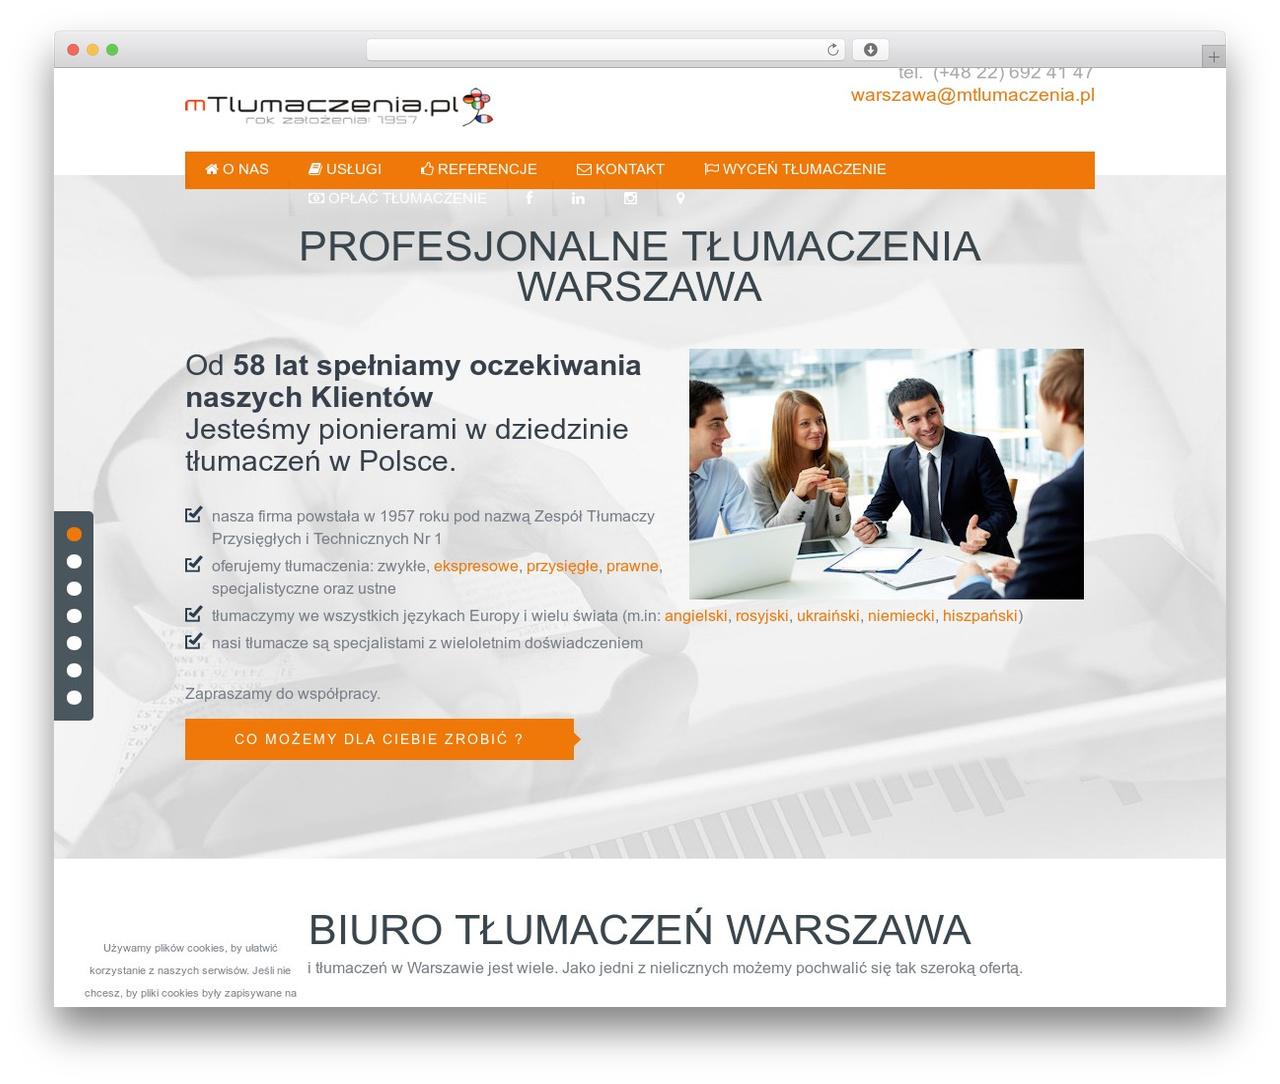 Tlumacze-warszawa best WordPress template - tlumacze-warszawa.pl